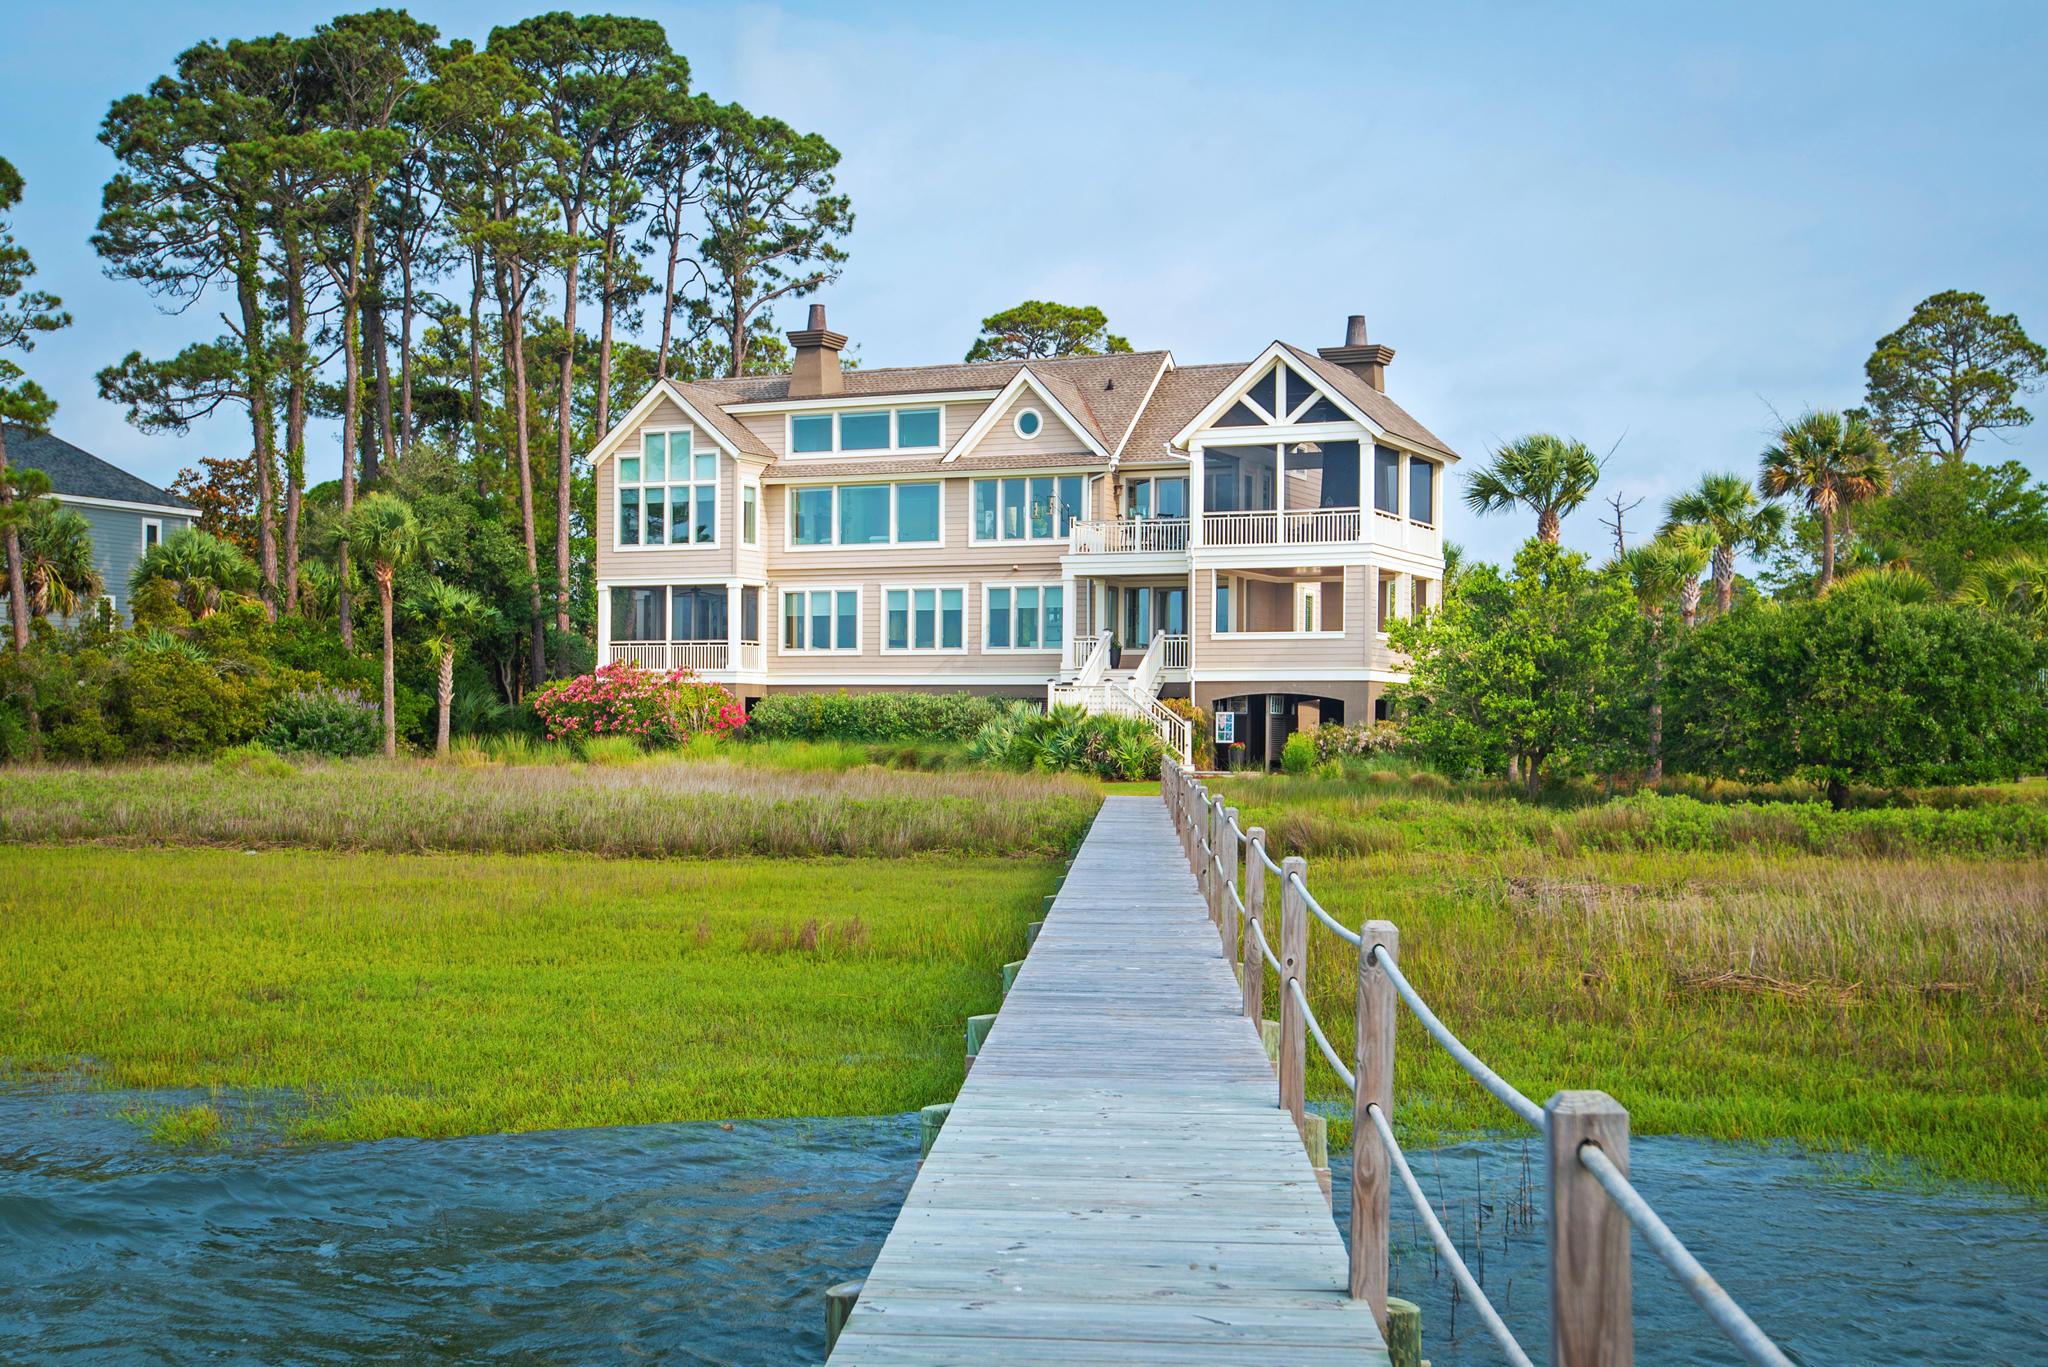 Seabrook Island Homes For Sale - 3135 Marshgate, Seabrook Island, SC - 63